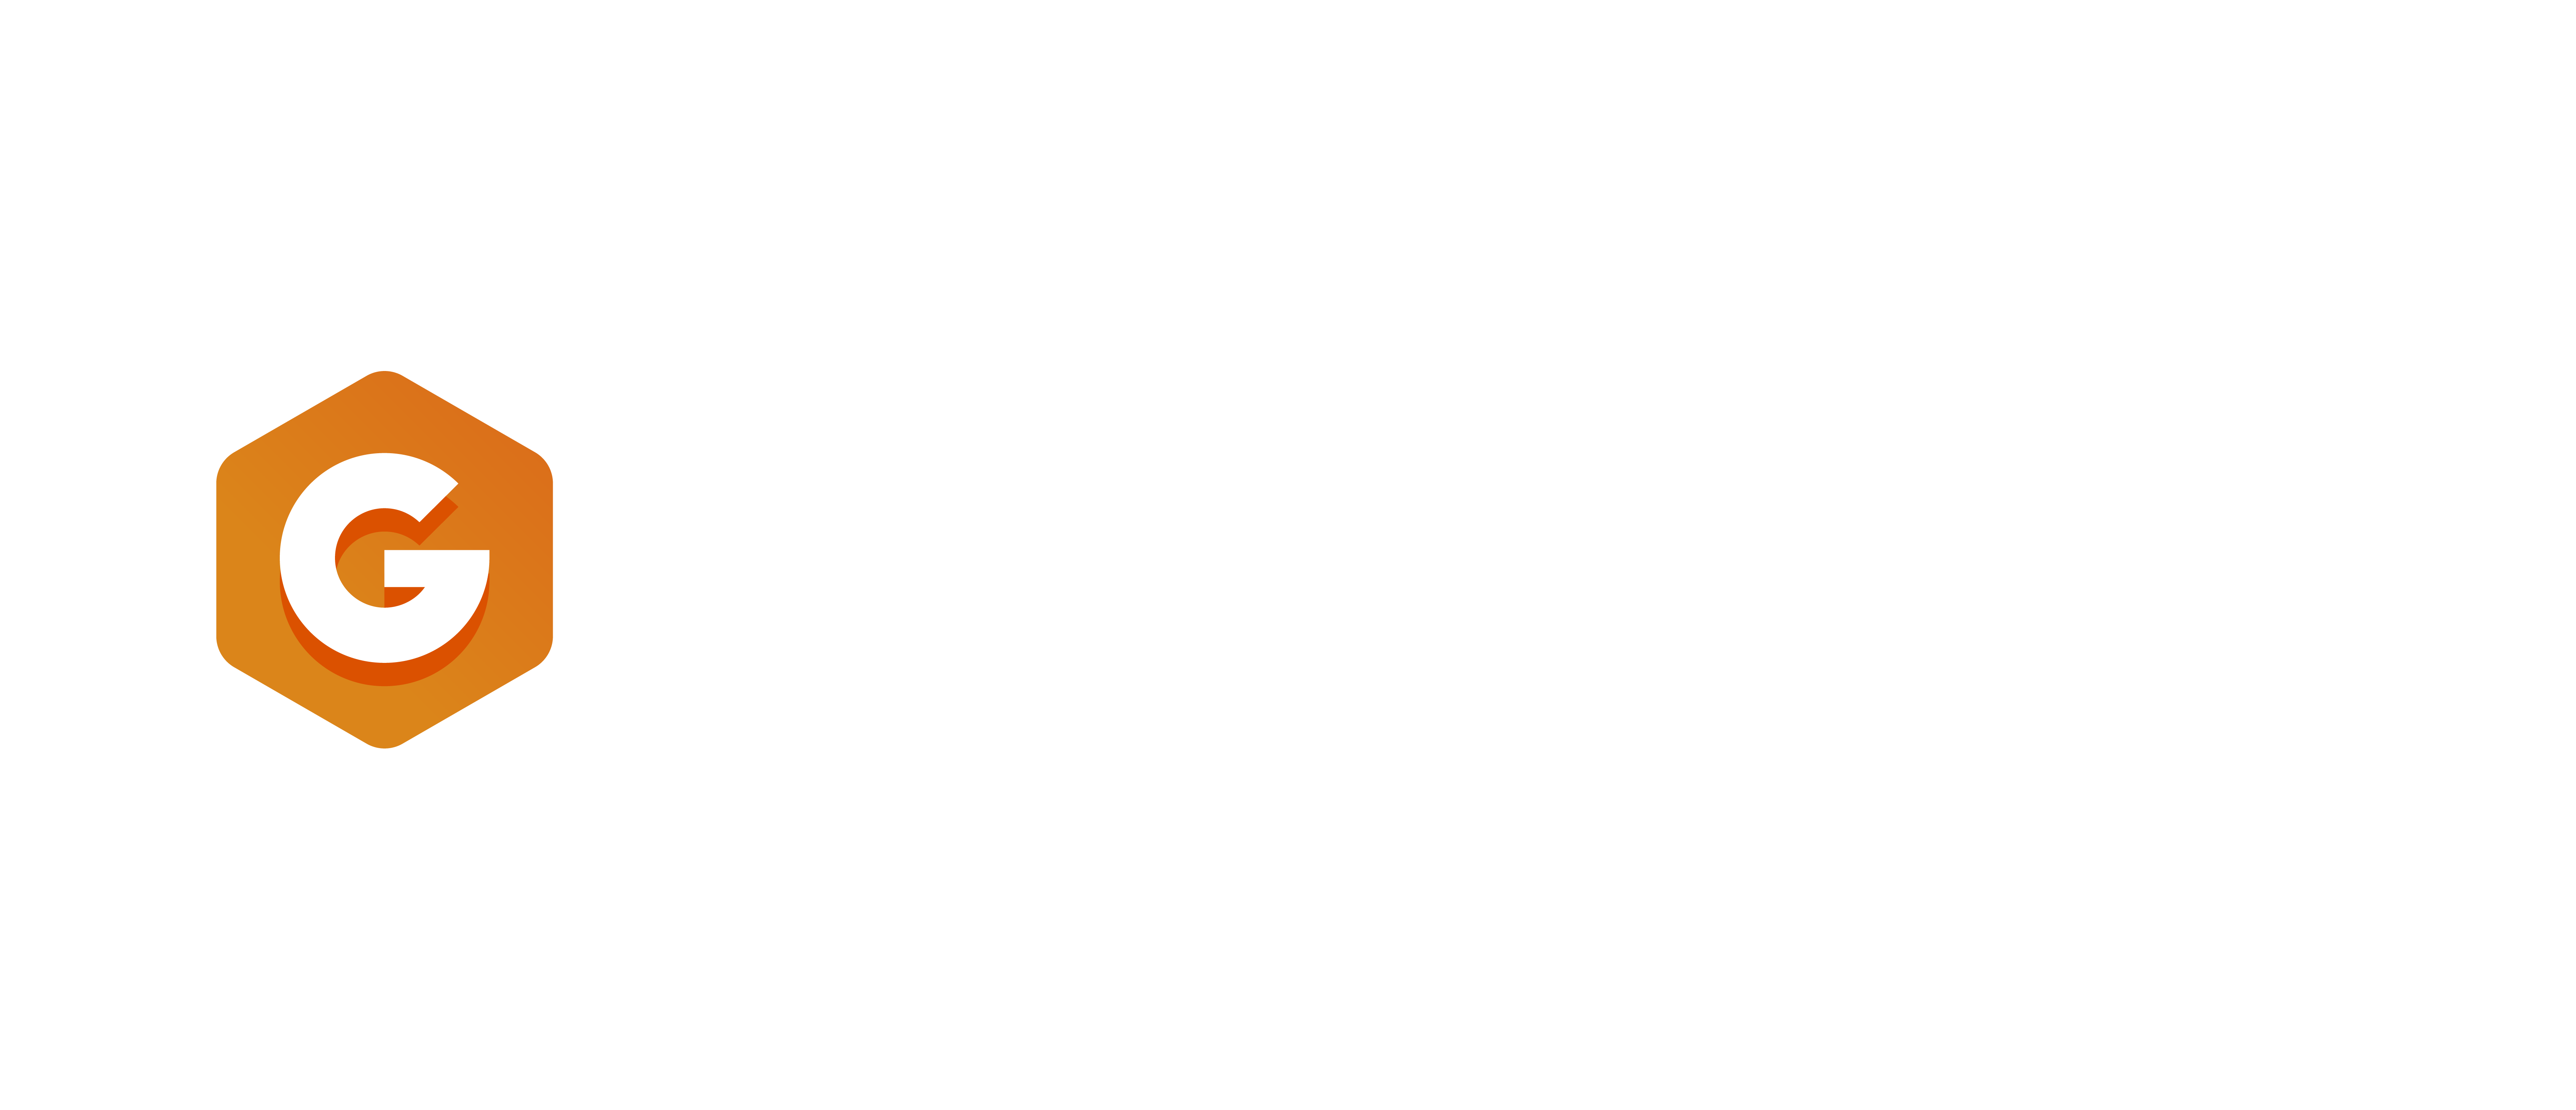 Groundhogg_logo-02